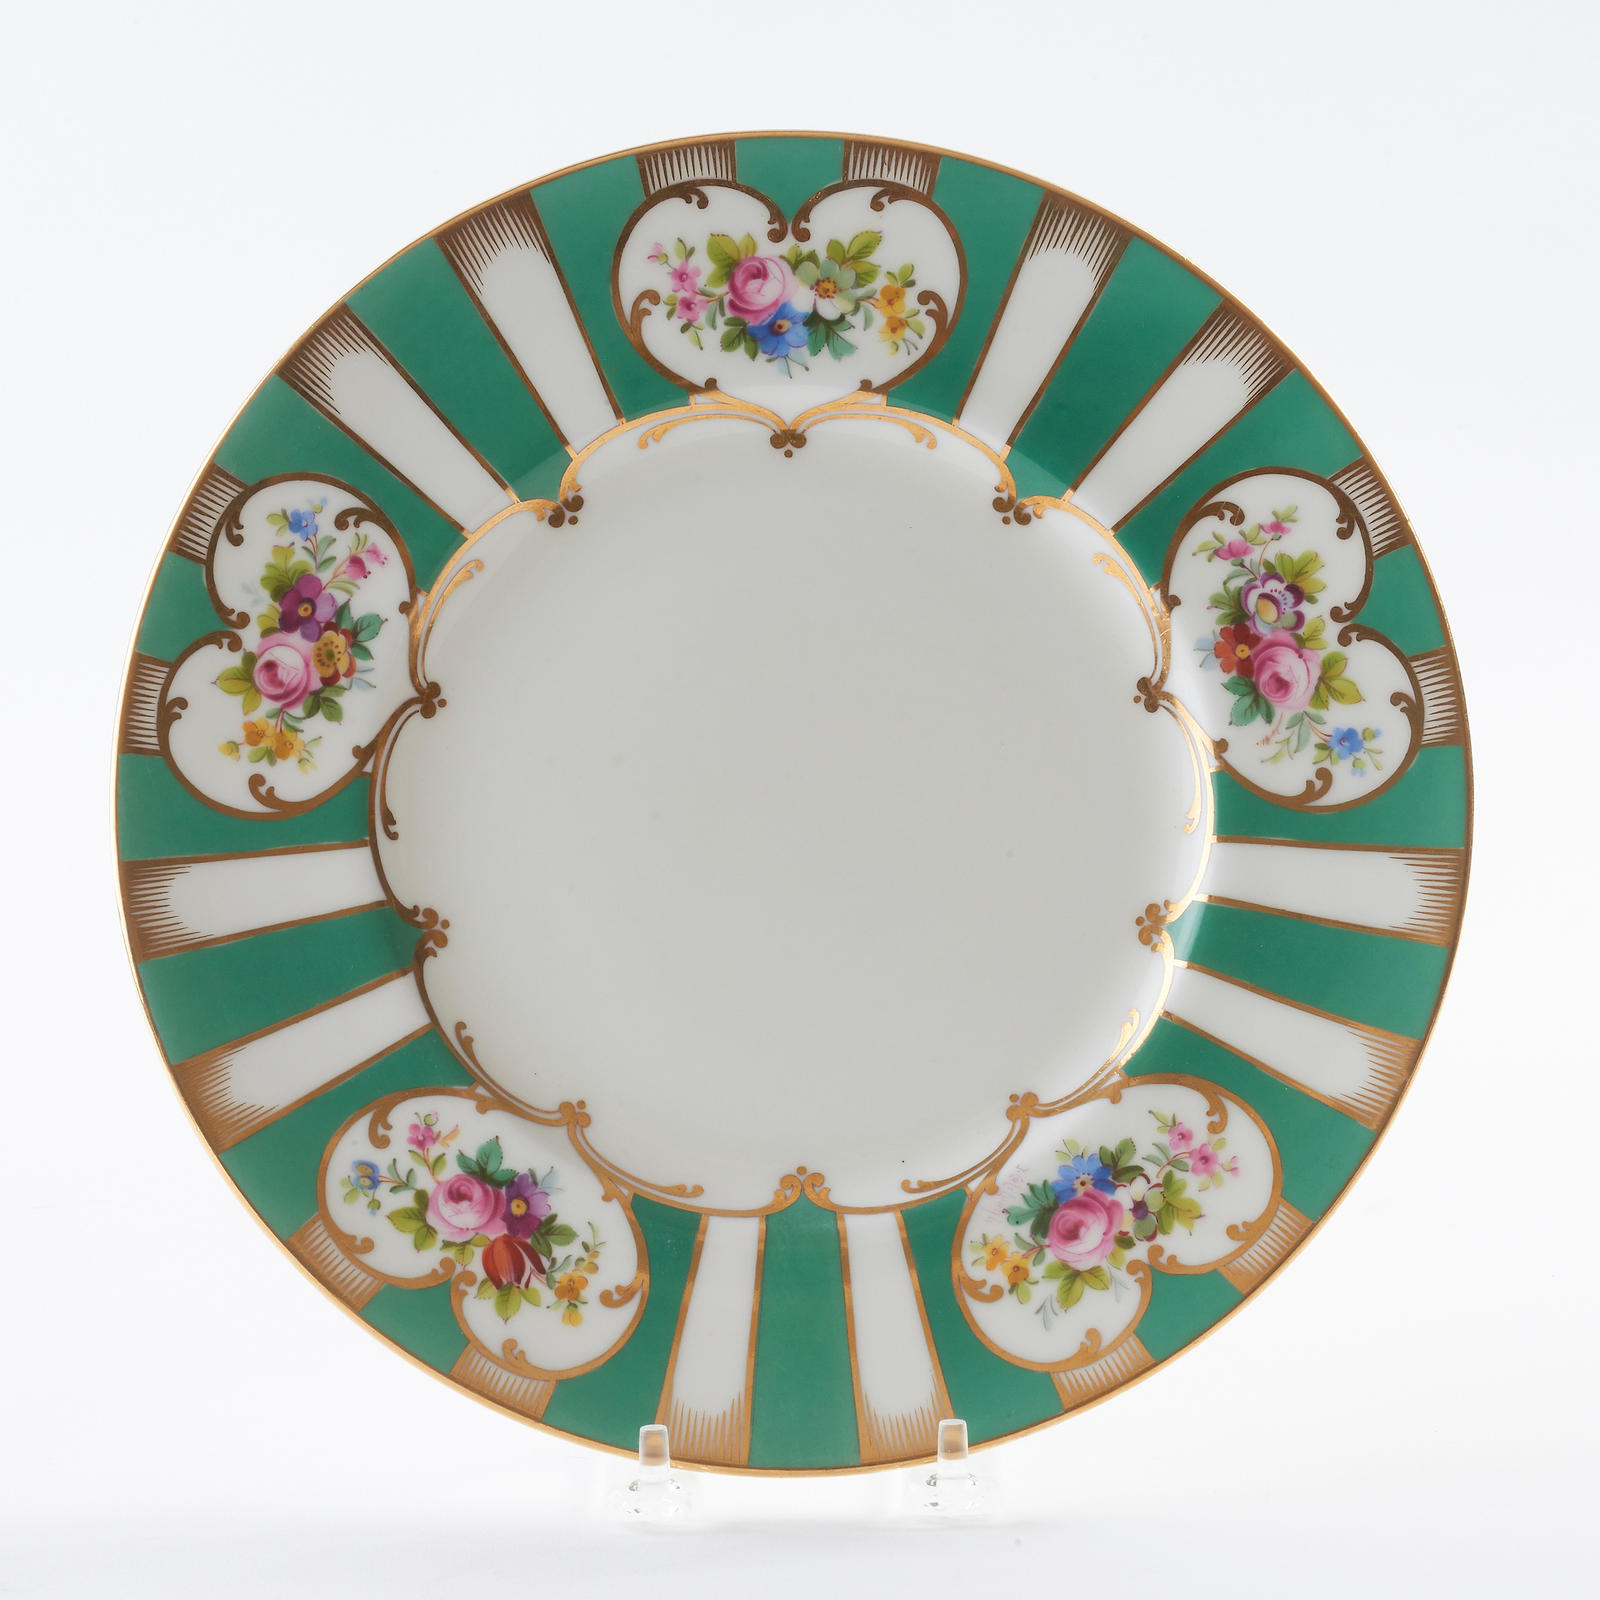 Set of 12 Dinner Plates  sc 1 st  Greenwald Antiques & Set of 12 Dinner Plates - Tableware - Greenwald Antiques